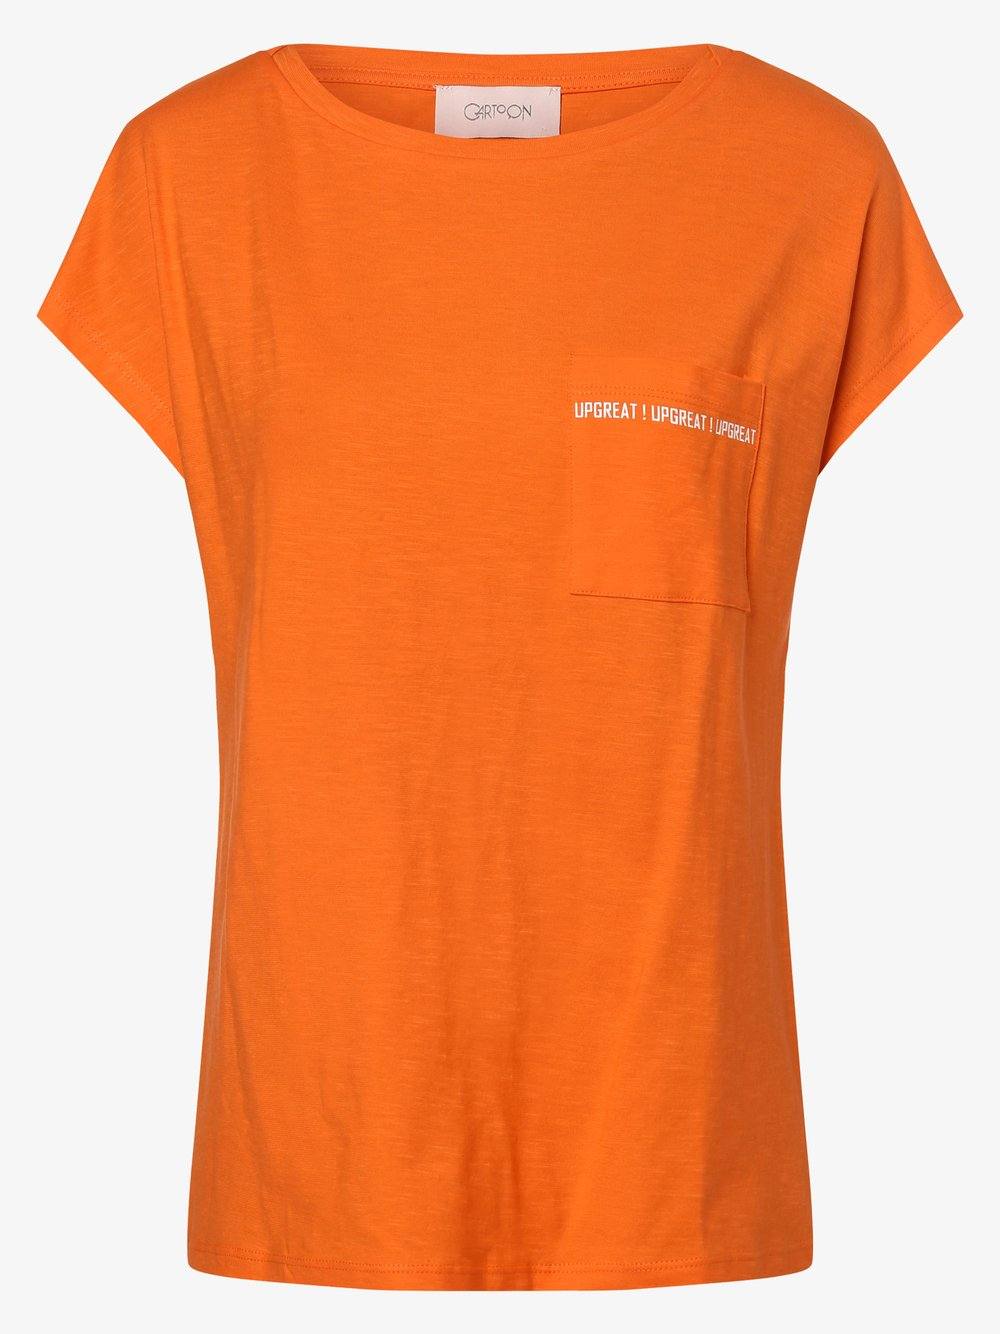 Cartoon UPgreat! – T-shirt damski, pomarańczowy Van Graaf 487181-0001-09920